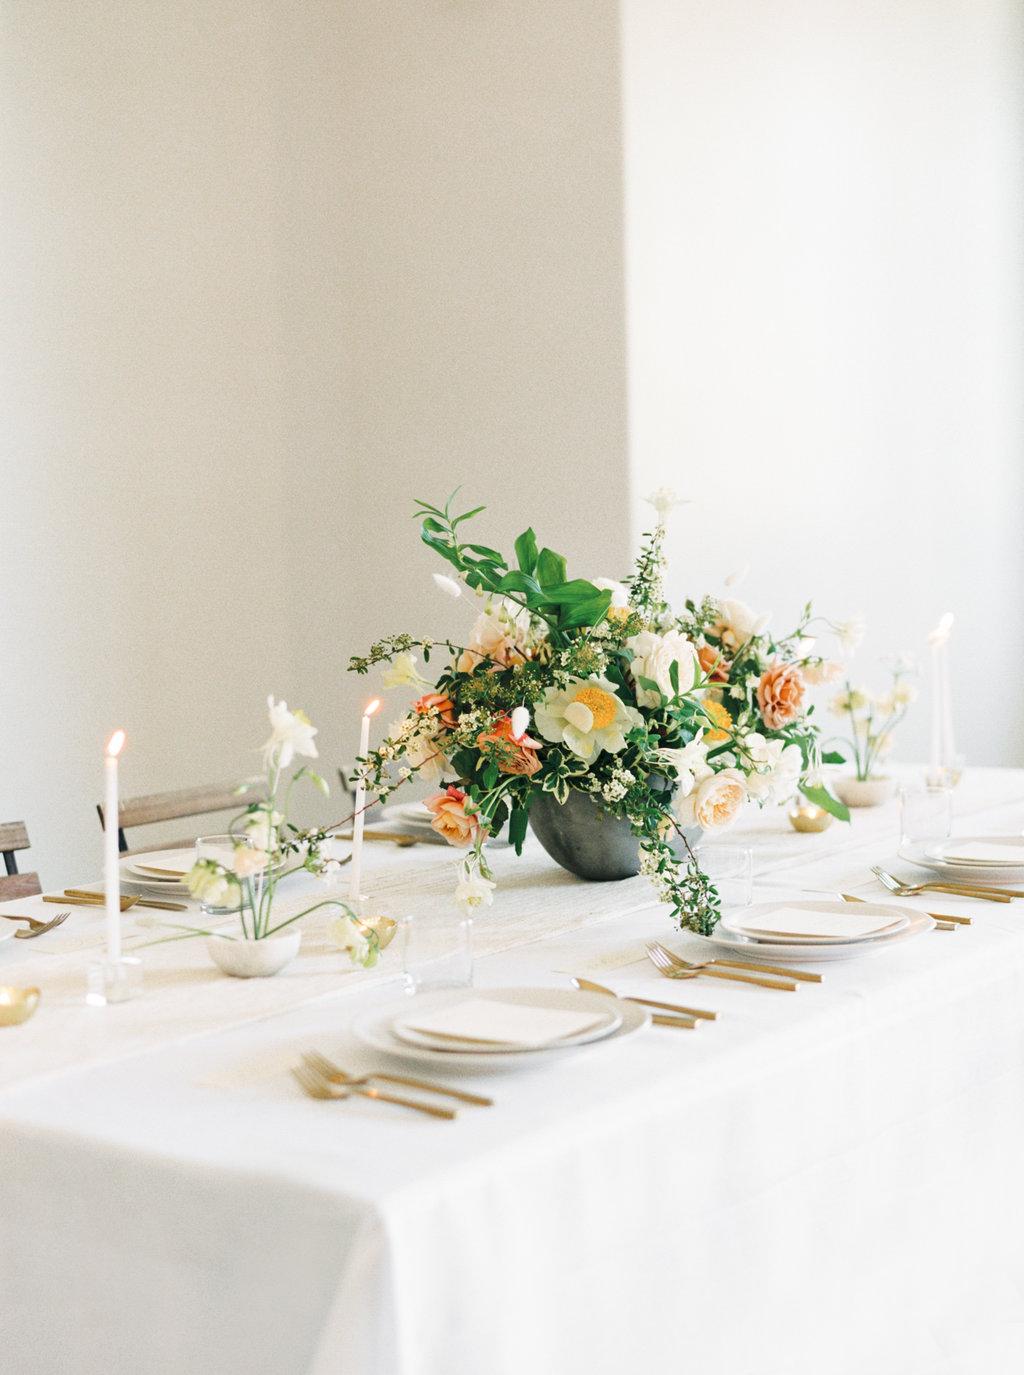 Kelsea_Holder_Photography_Rava_Wines_Bloom_Floral_and_Foliage_7.jpg